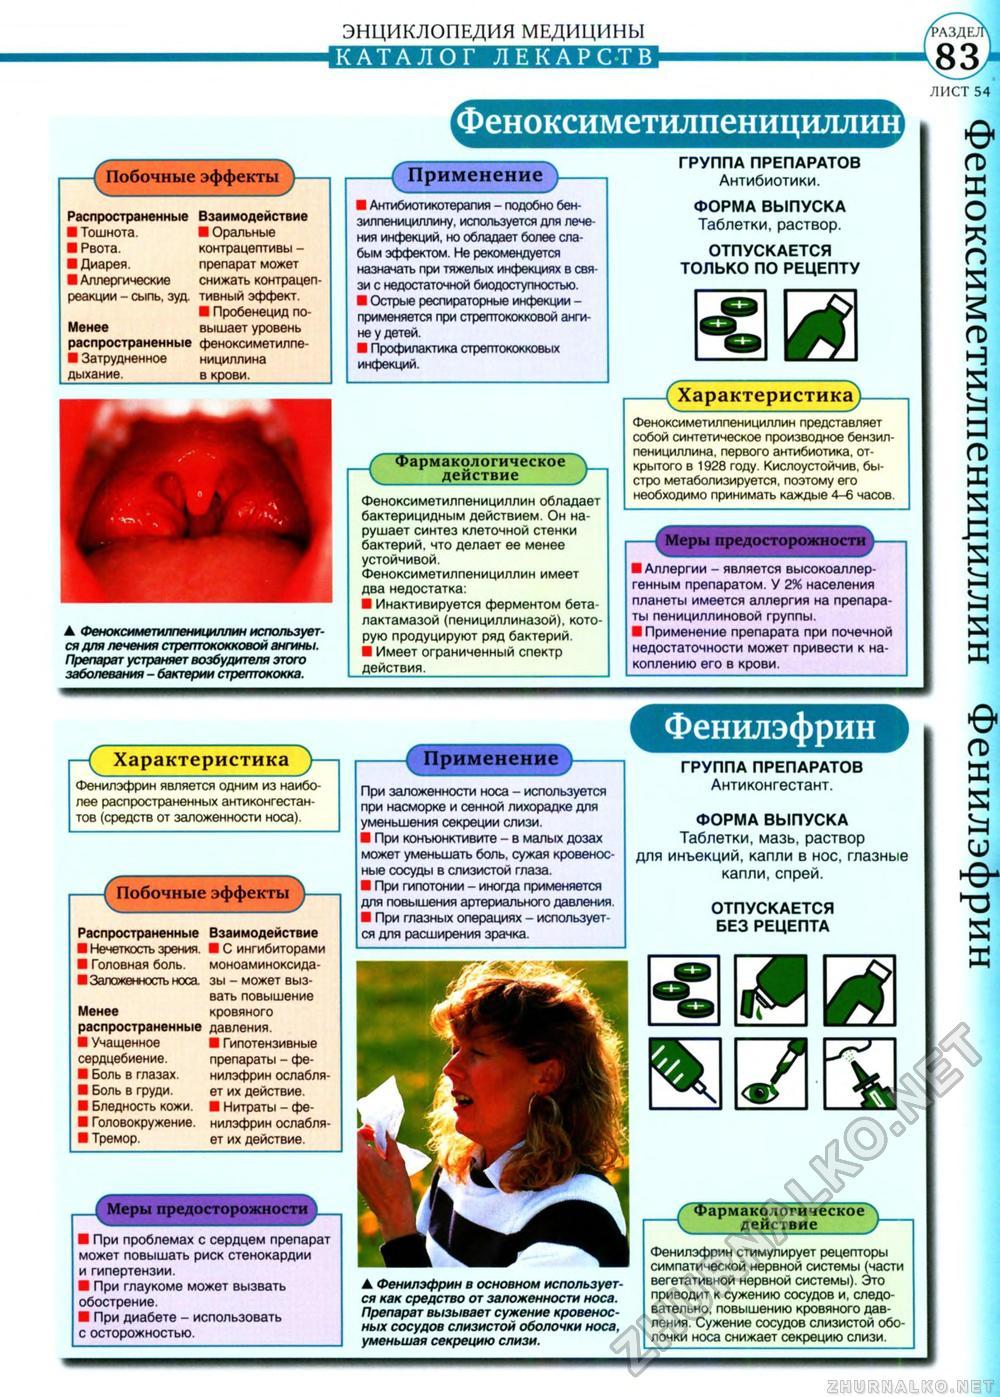 Феноксиметилпенициллин фото